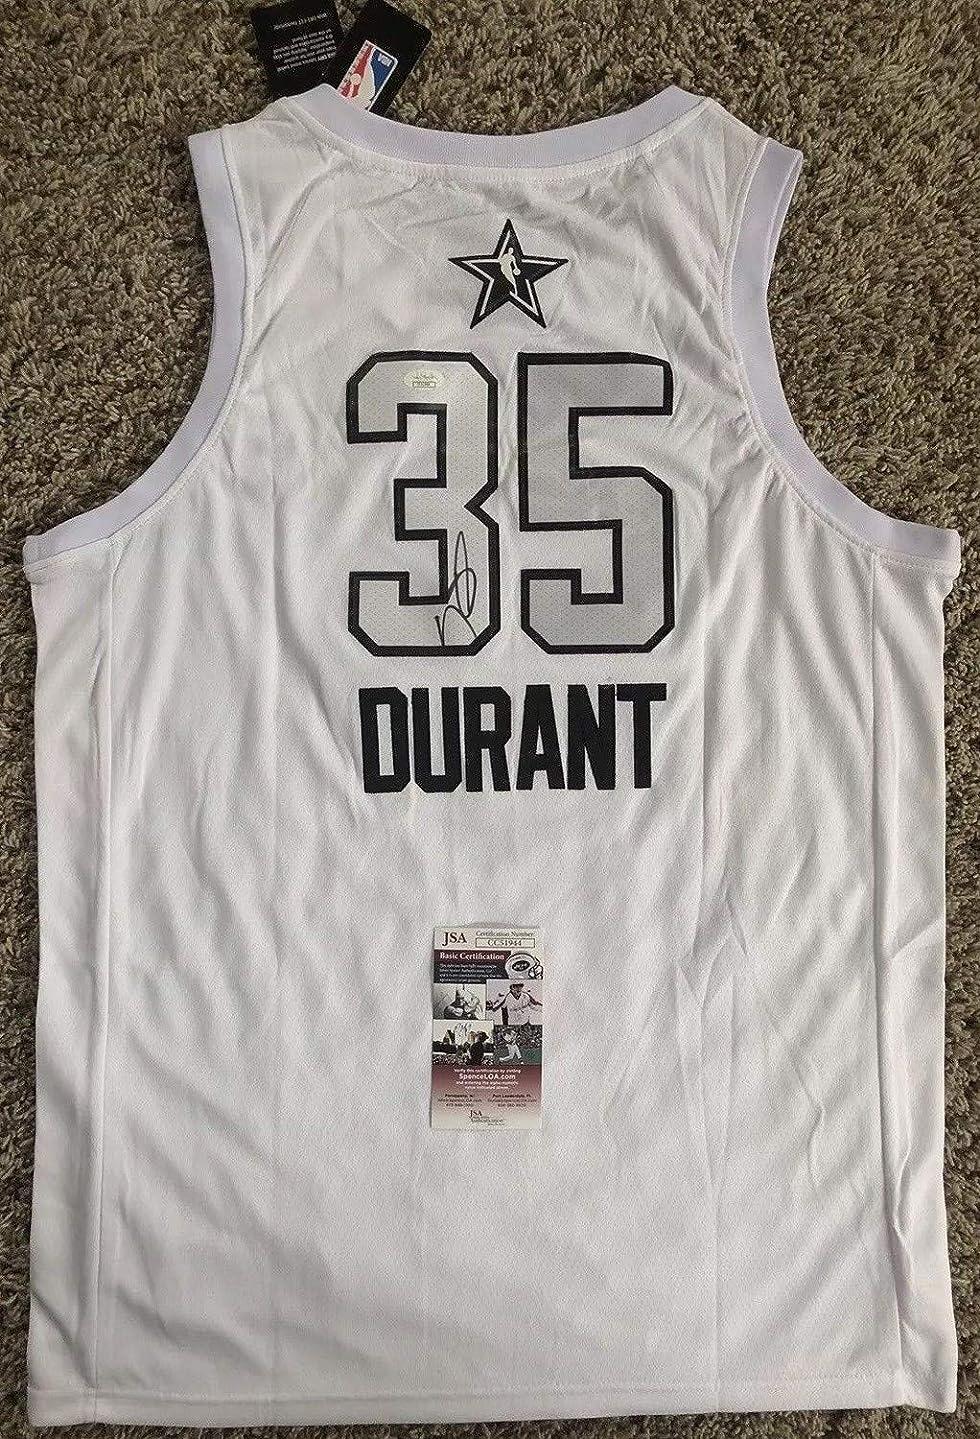 Kevin Durant Autographed Signed 2018 Nba All Star Game Jersey Memorabilia JSA COA #35 Warriors Nba Mvp